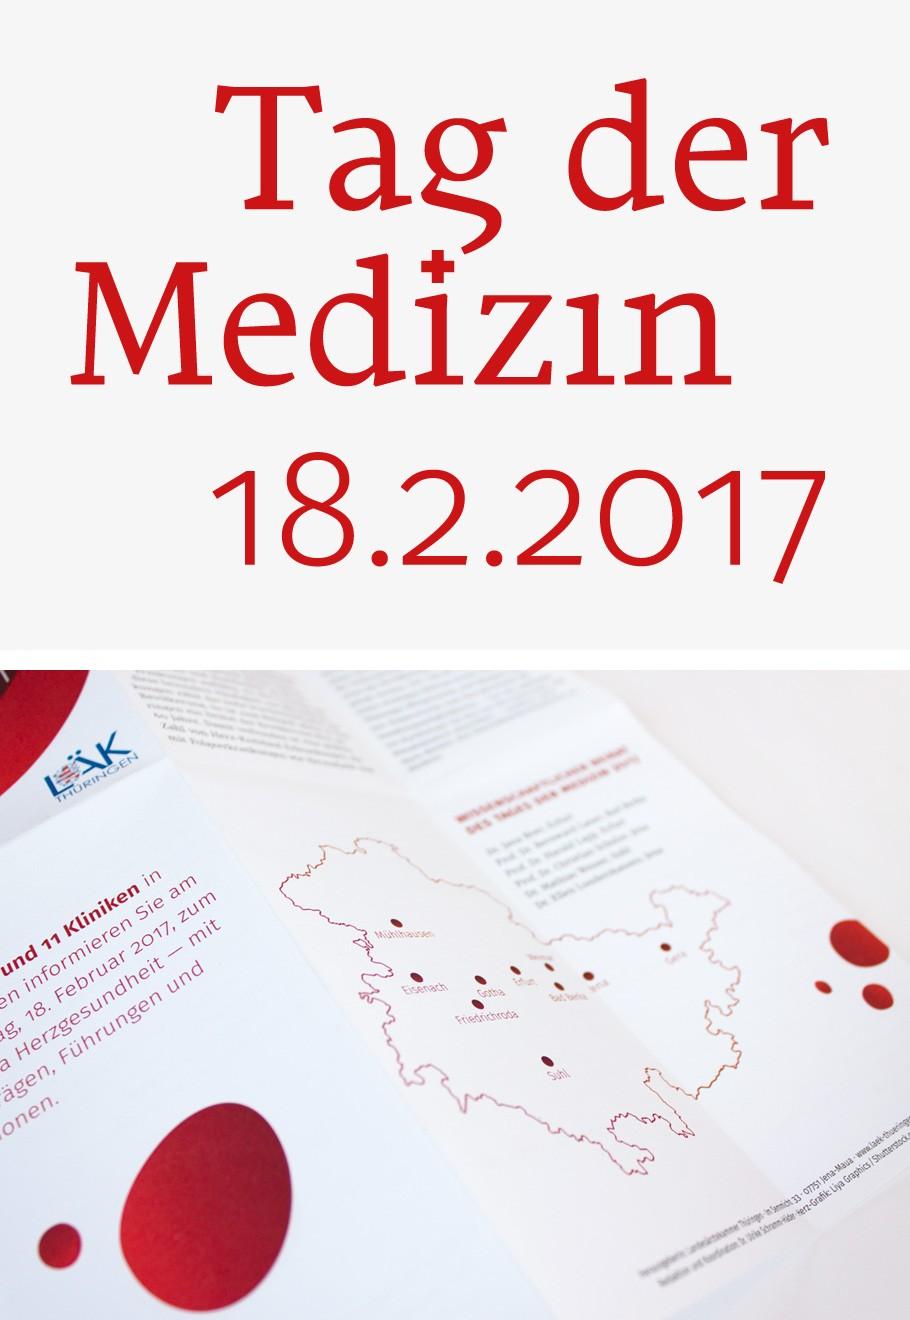 Tag der Medizin 2017 · Marke